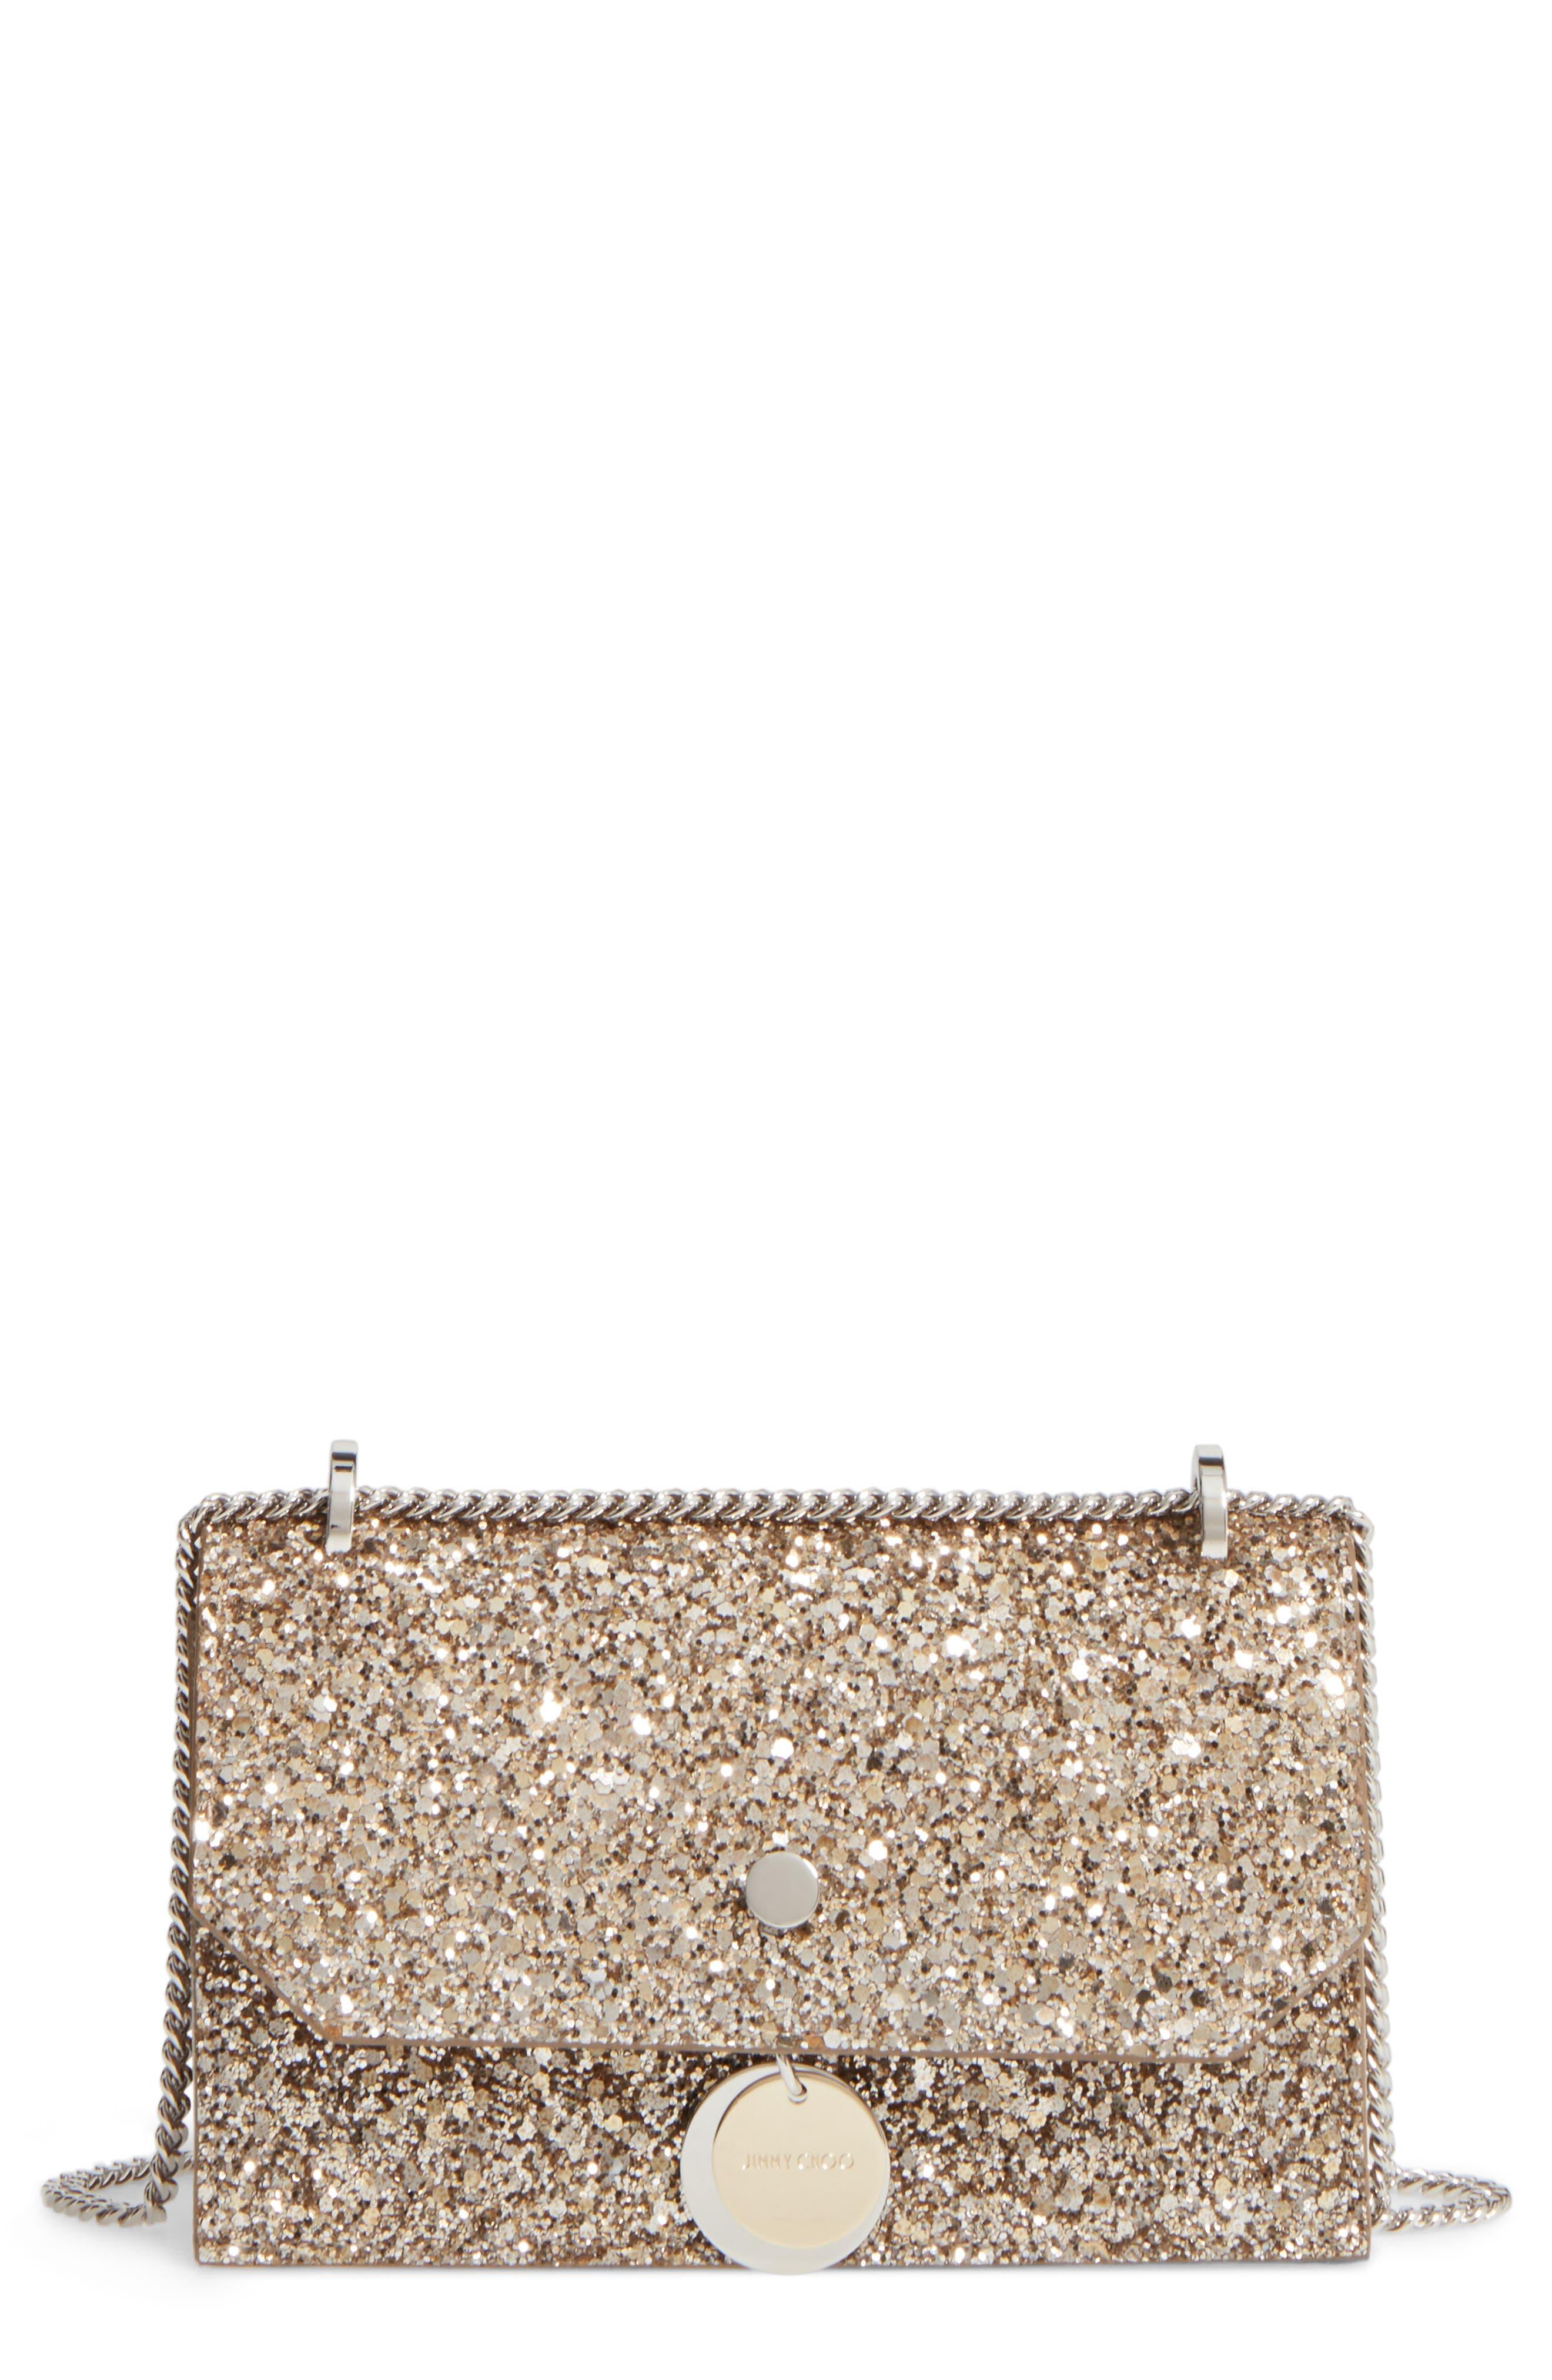 Main Image - Jimmy Choo Finley Shadow Glitter Shoulder Bag